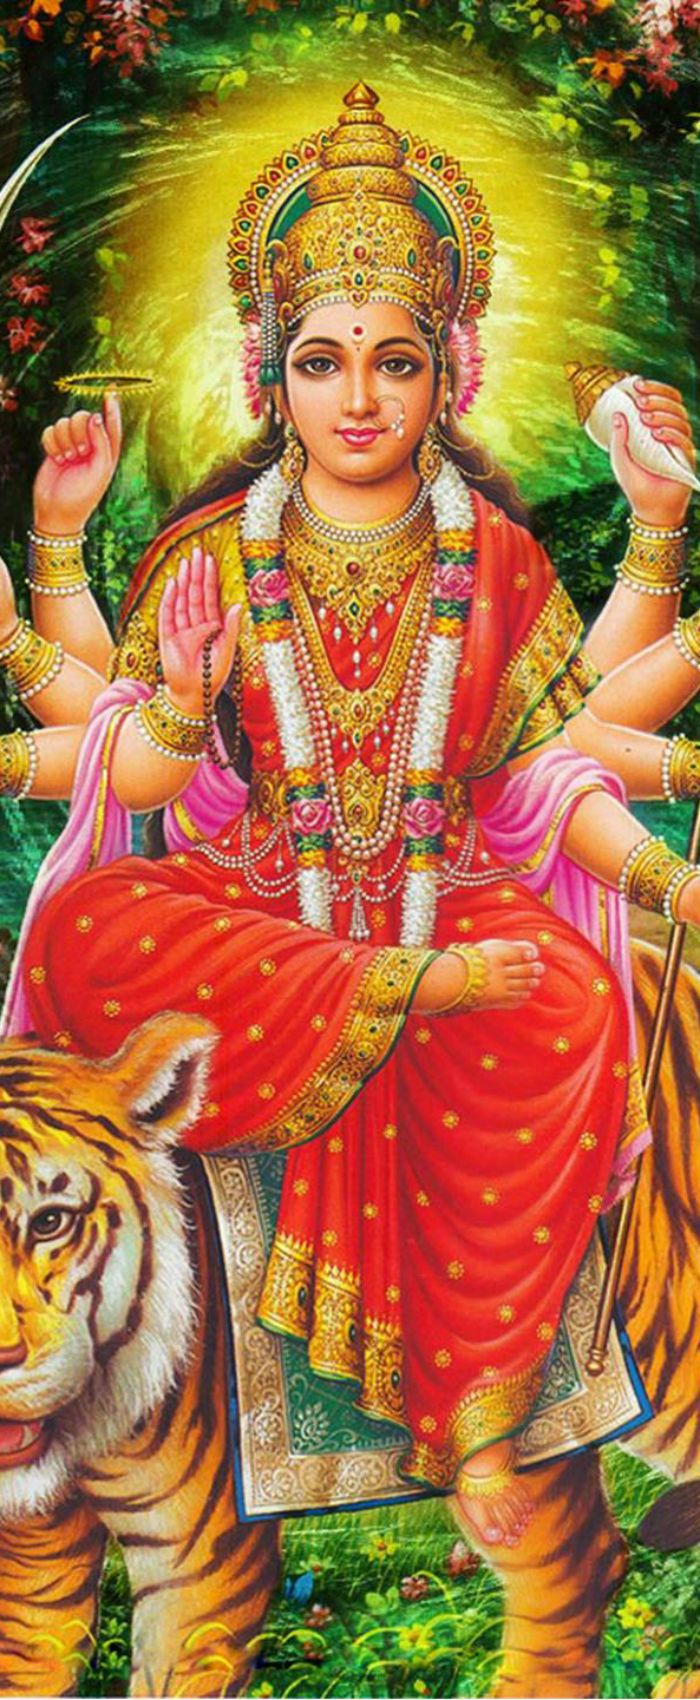 Jai Ambe Gauri – Aarti of Goddess Durga